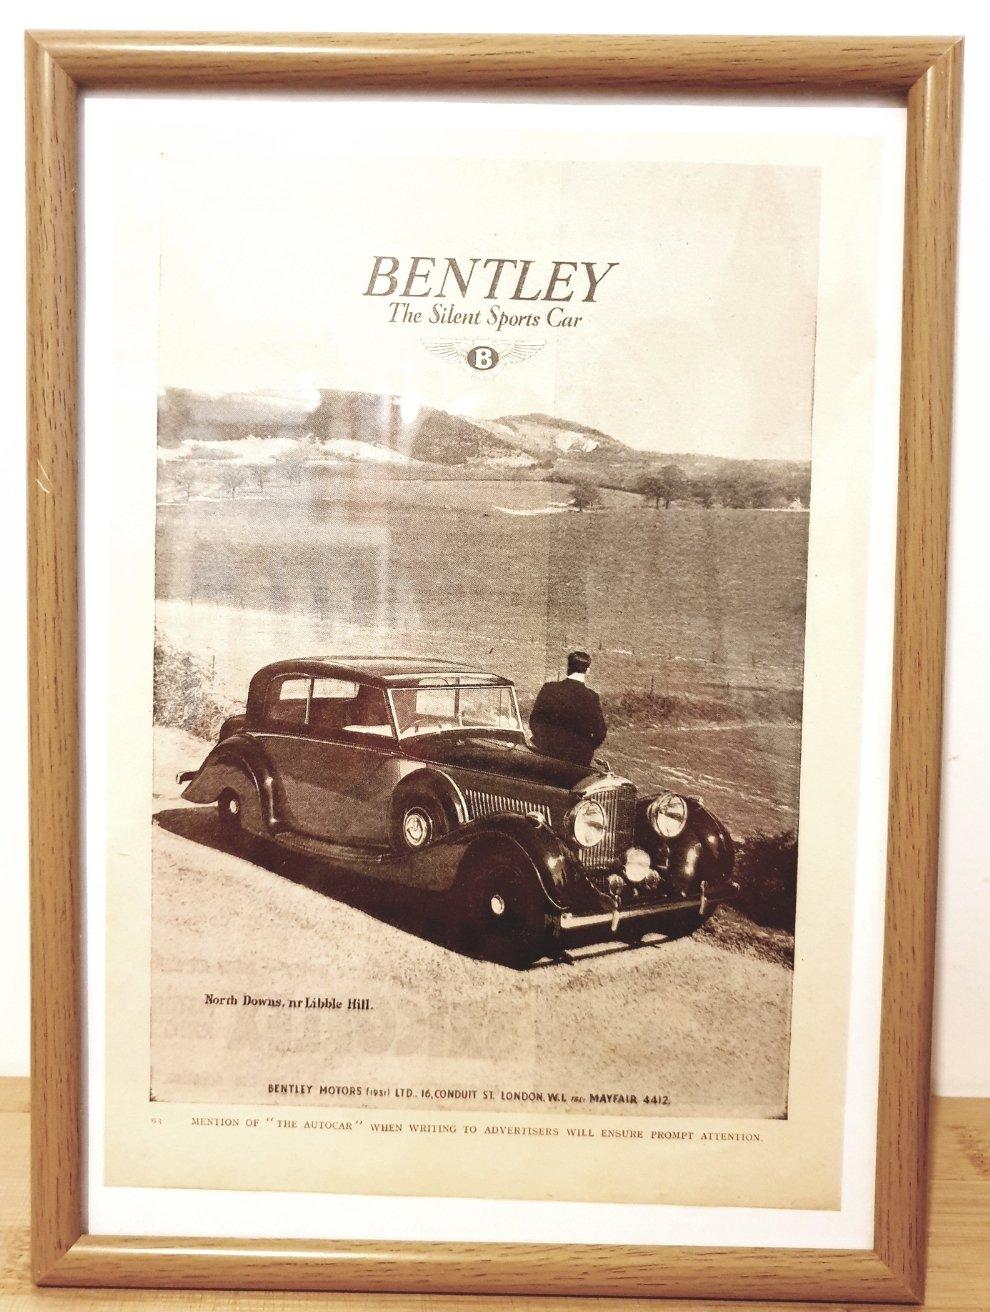 1968 Original 1940 Bentley Mark 5 Framed Advert  For Sale (picture 1 of 3)